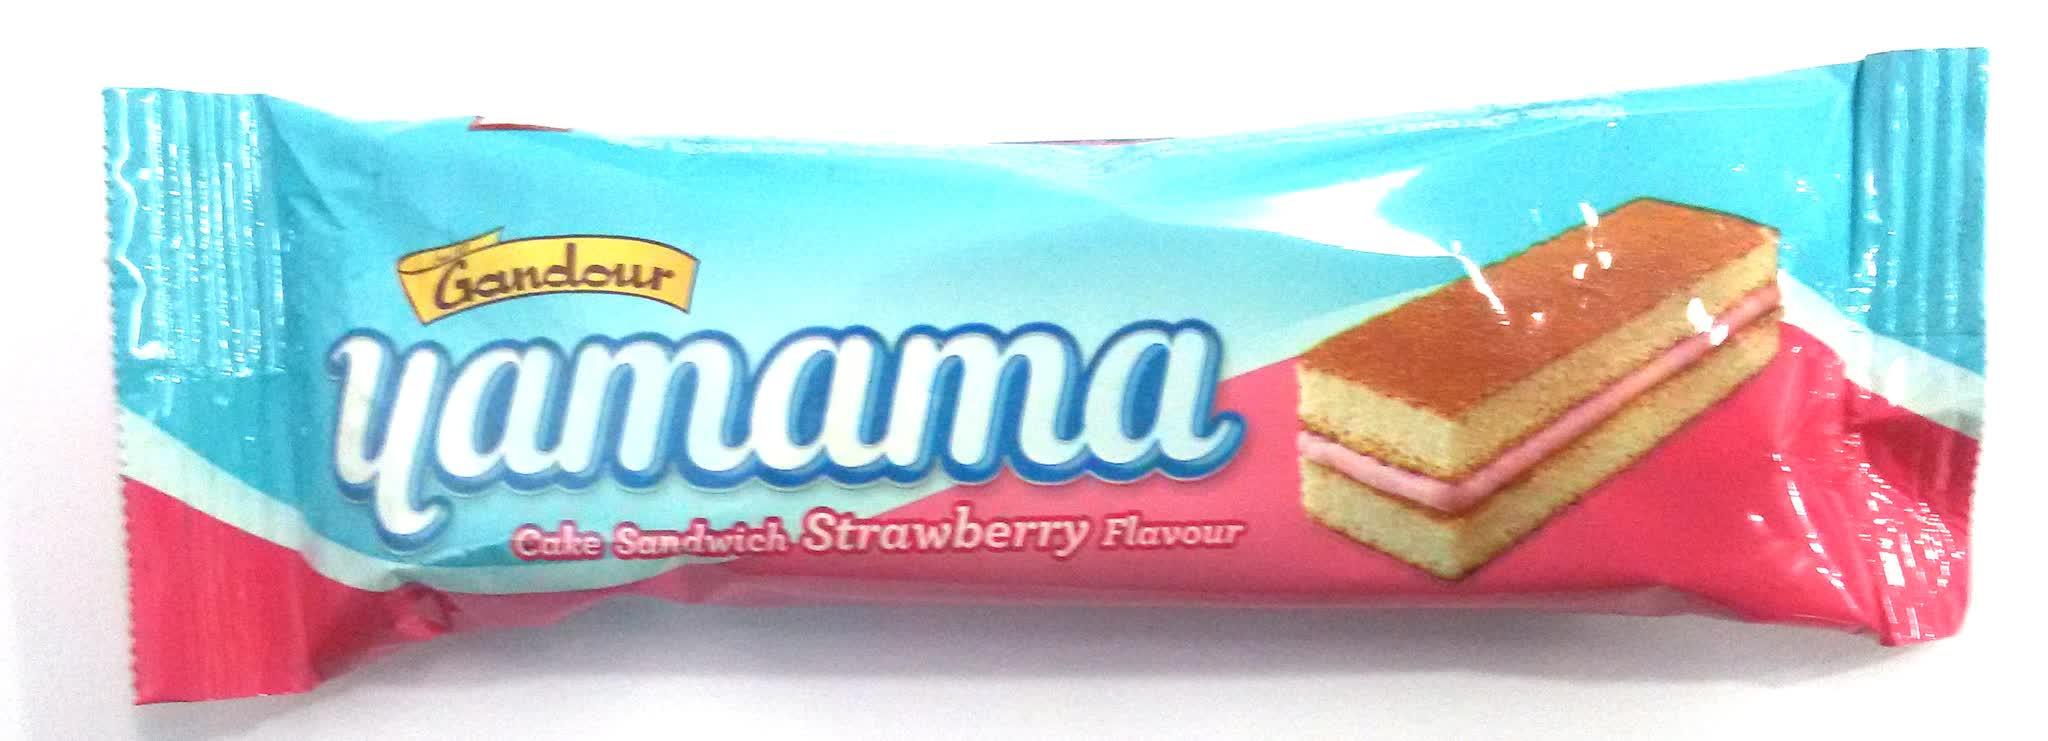 Gandour Yamama Strawberry Flavour Sandwich Cake